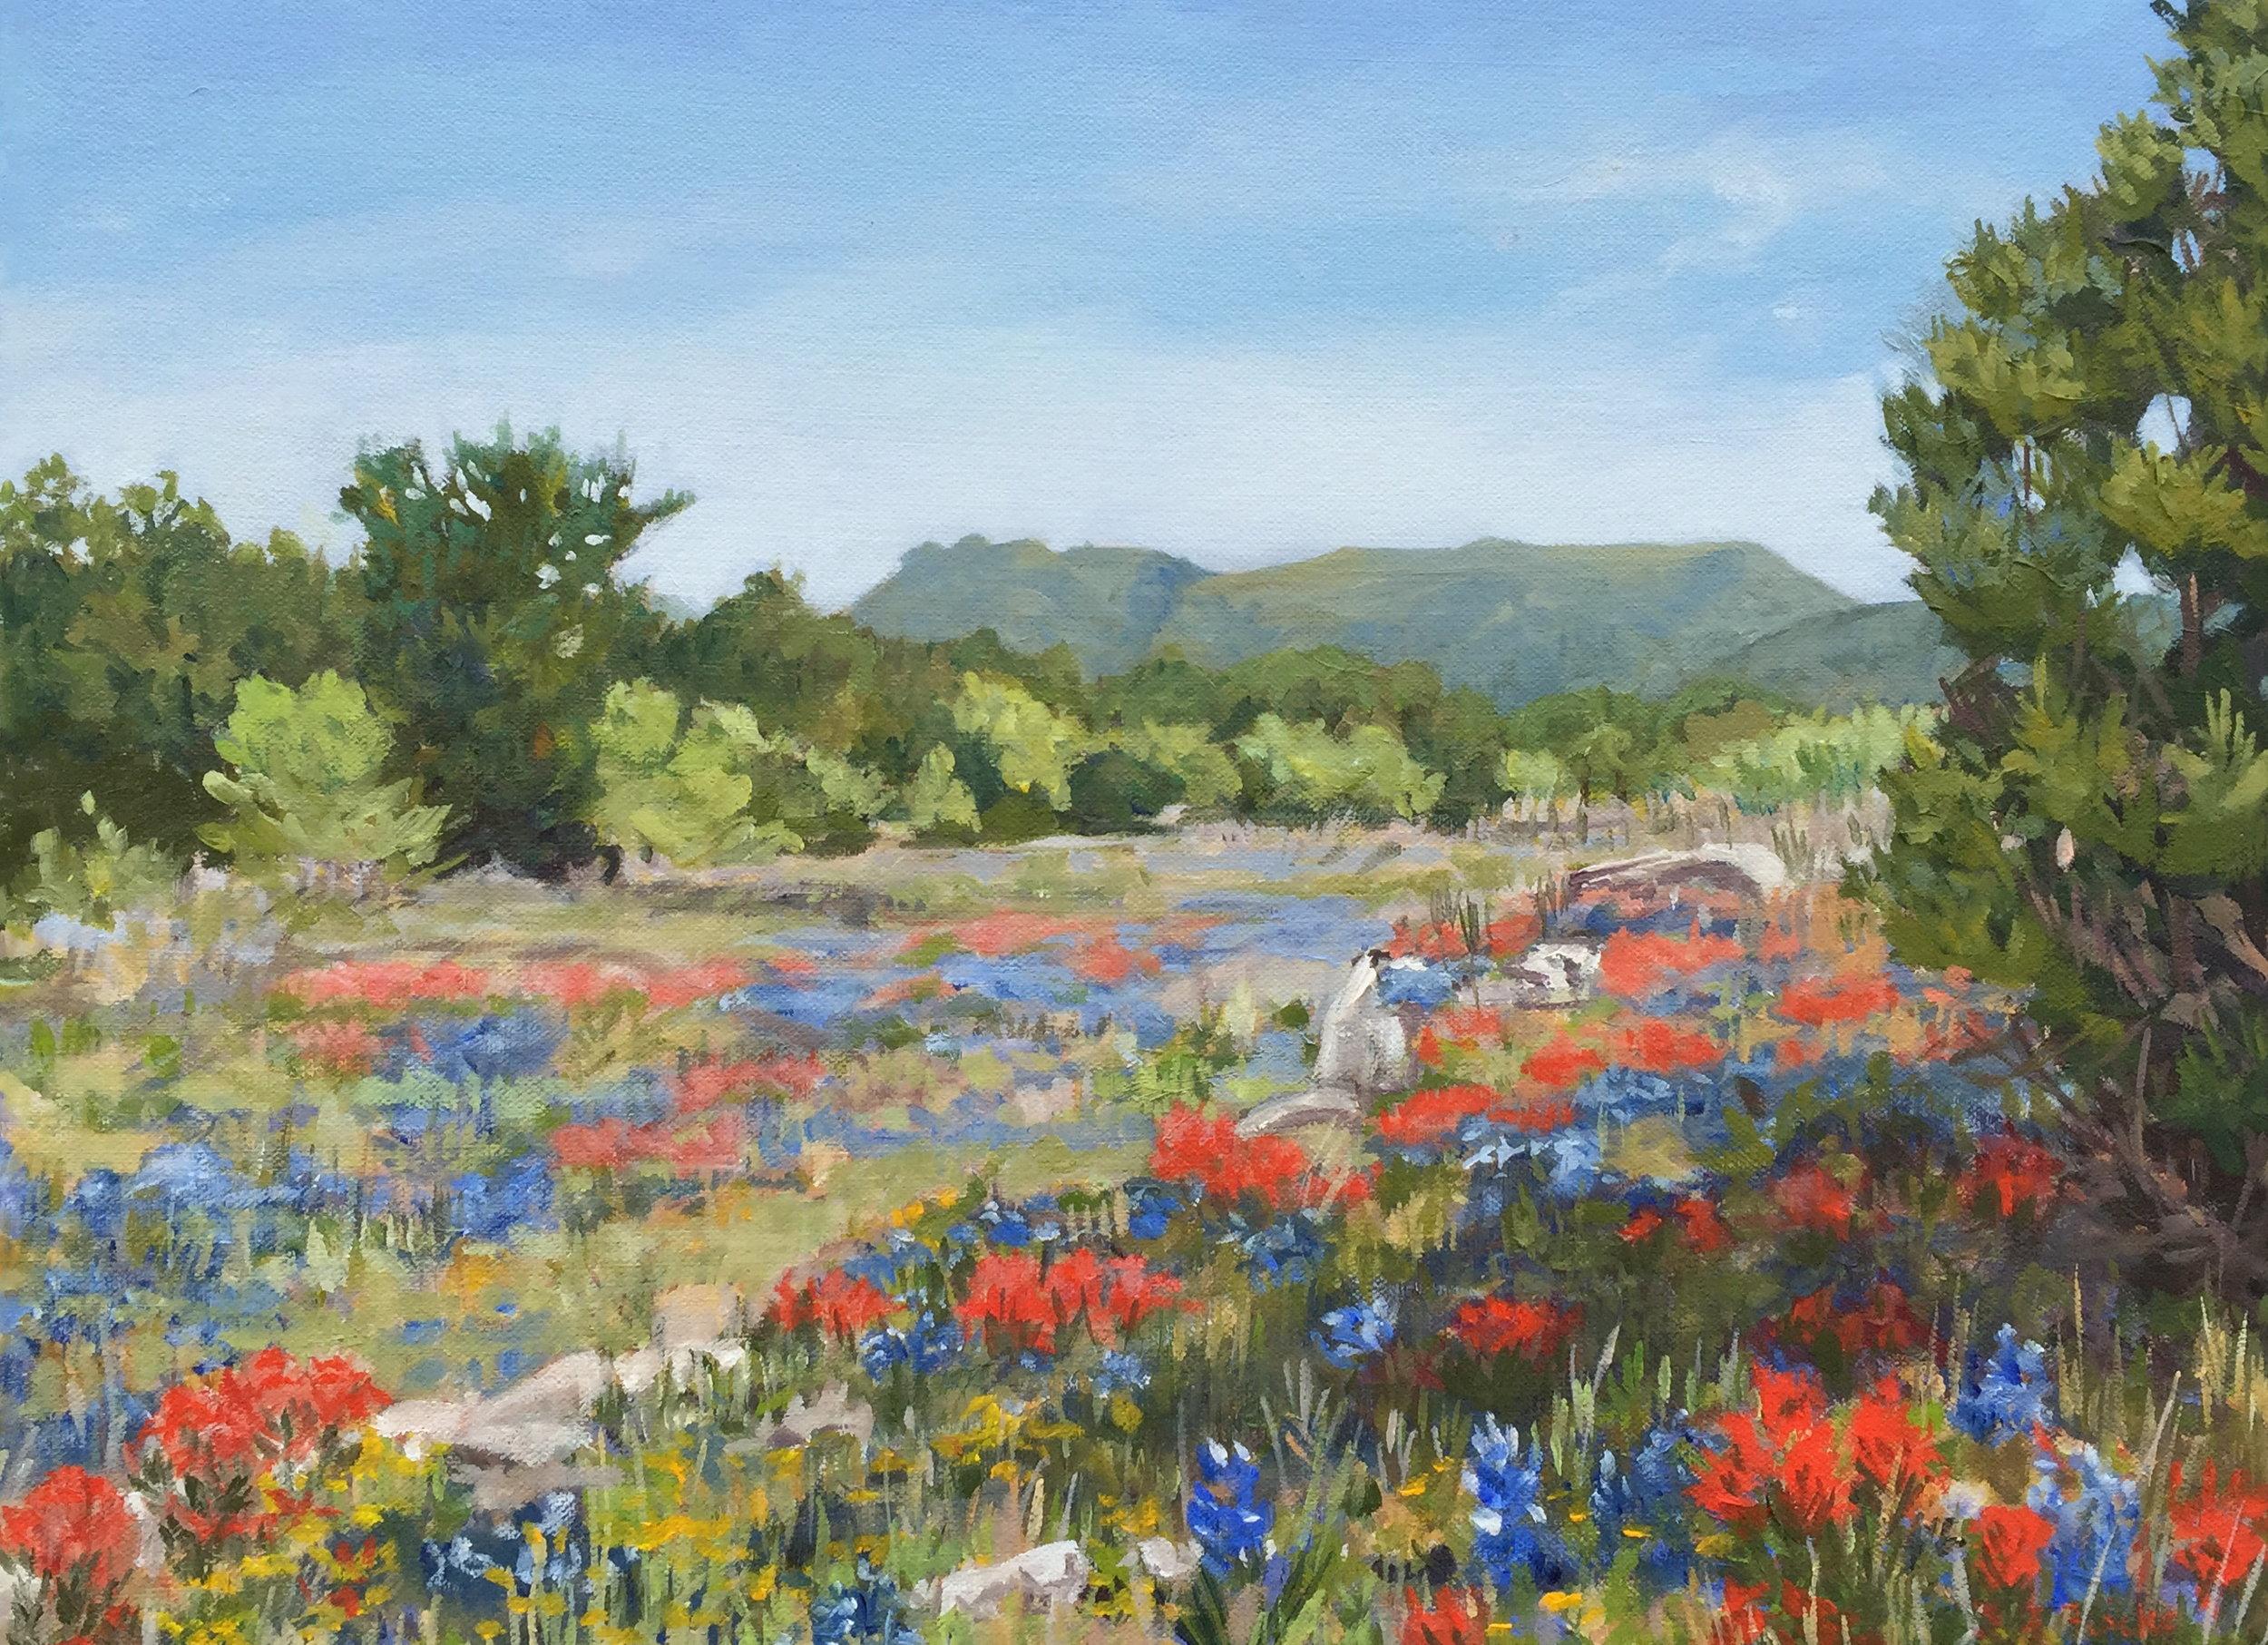 Mason County by Lona Flocken   12x16 oil on canvas